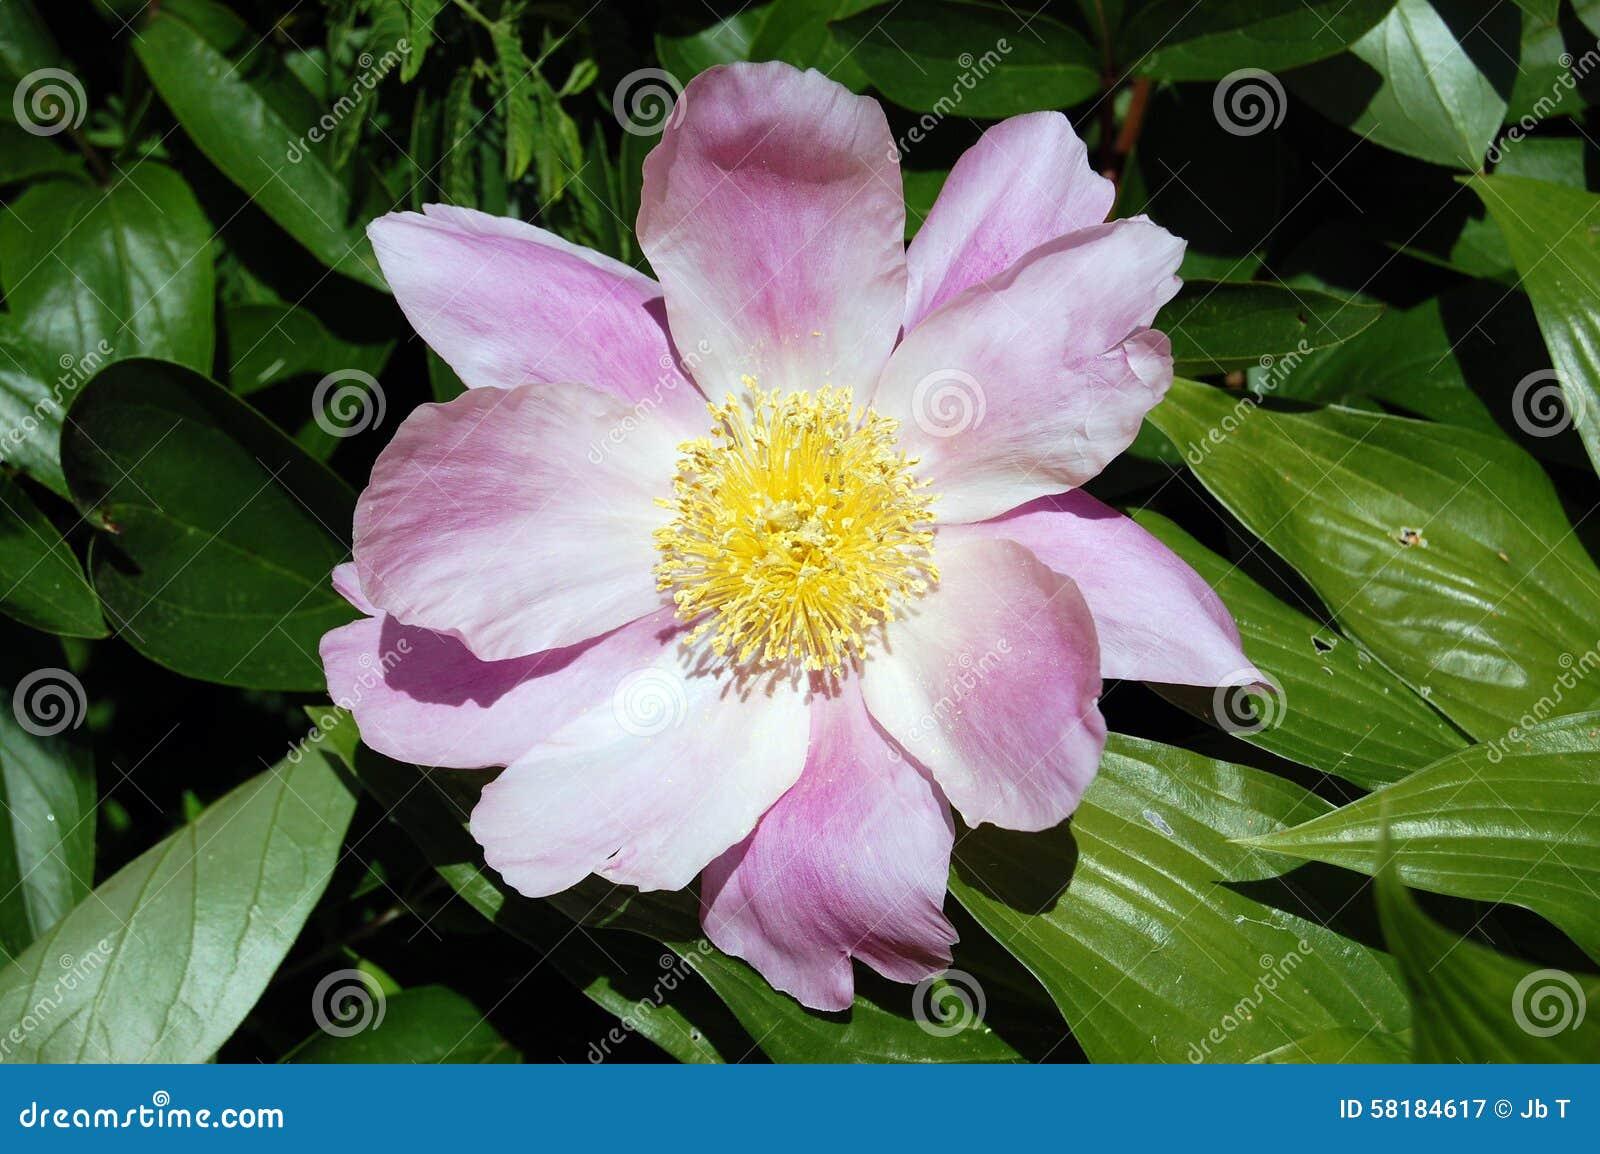 Pink Flower With Yellow Center Closeup Stock Photo 58184617 Megapixl